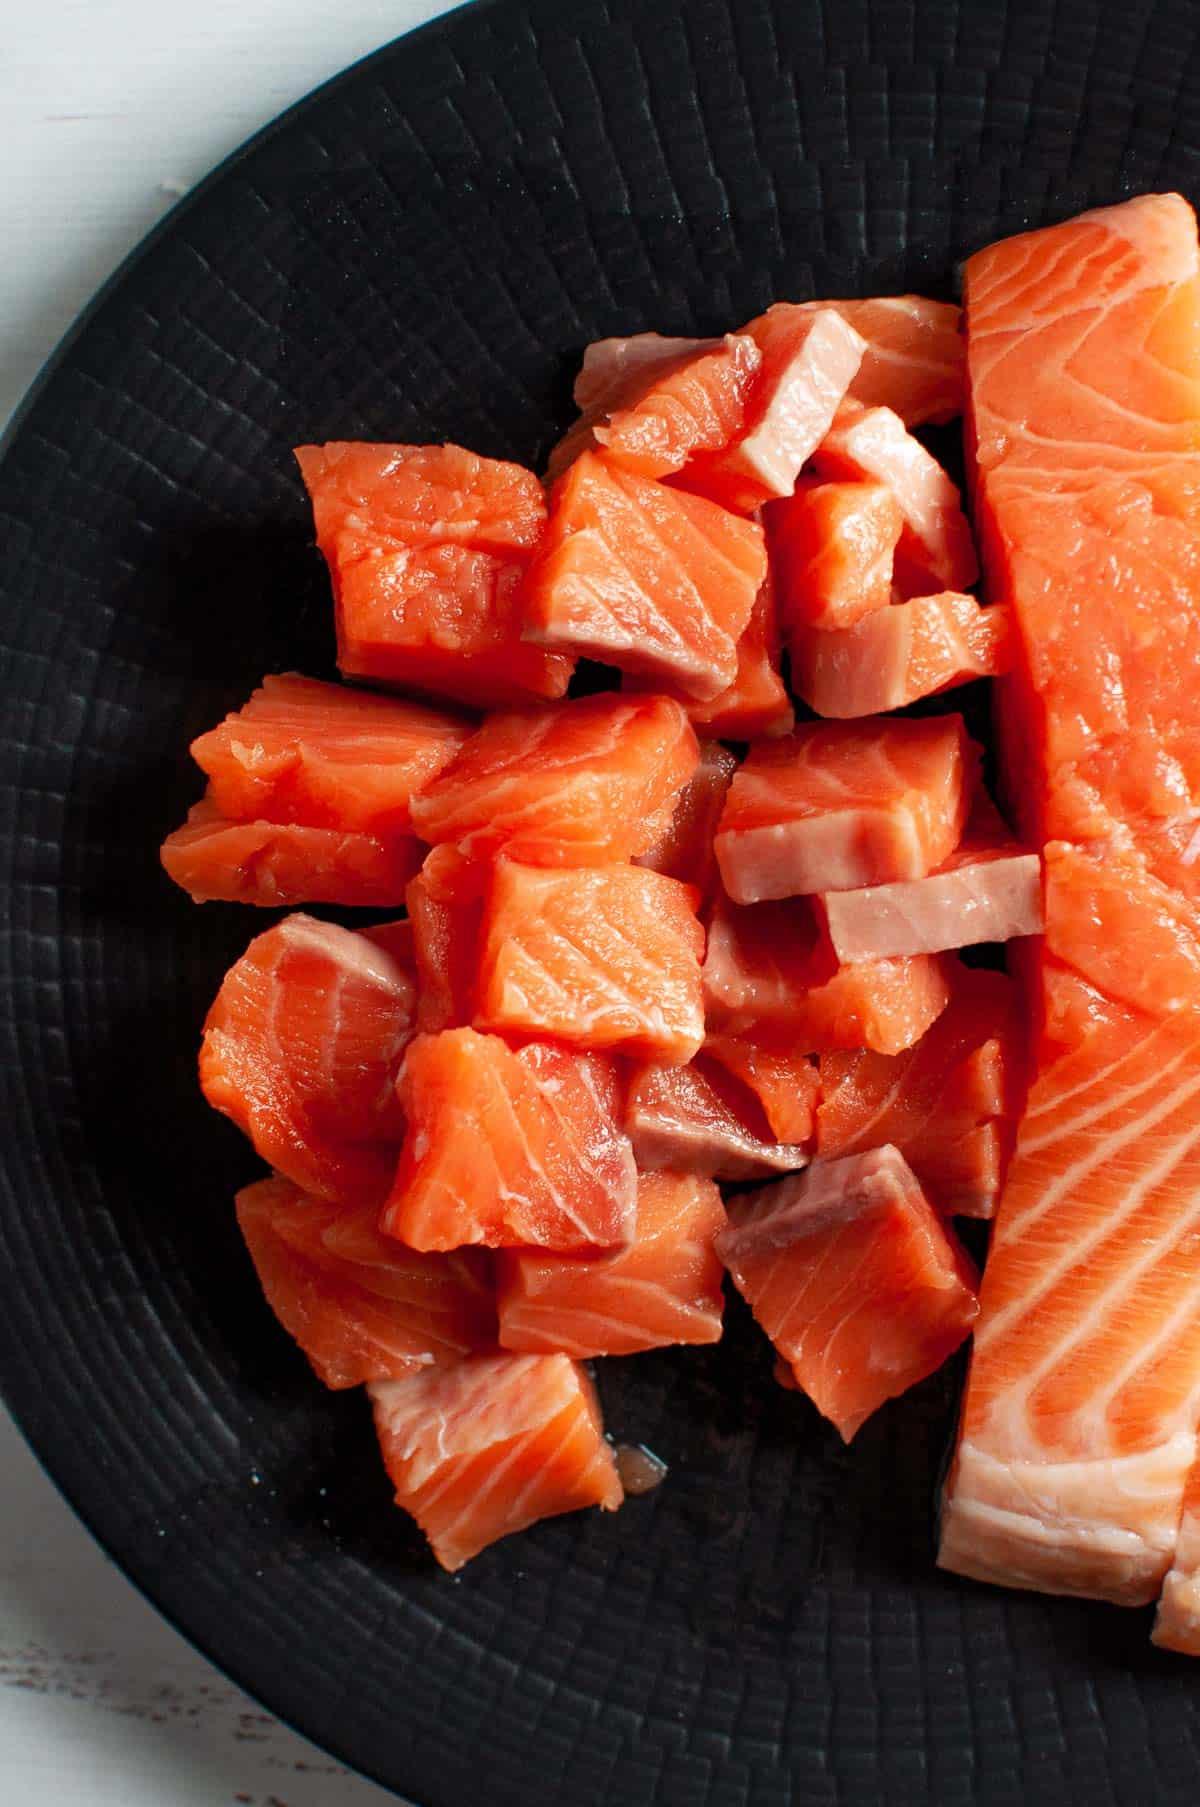 chopped salmon on a plate